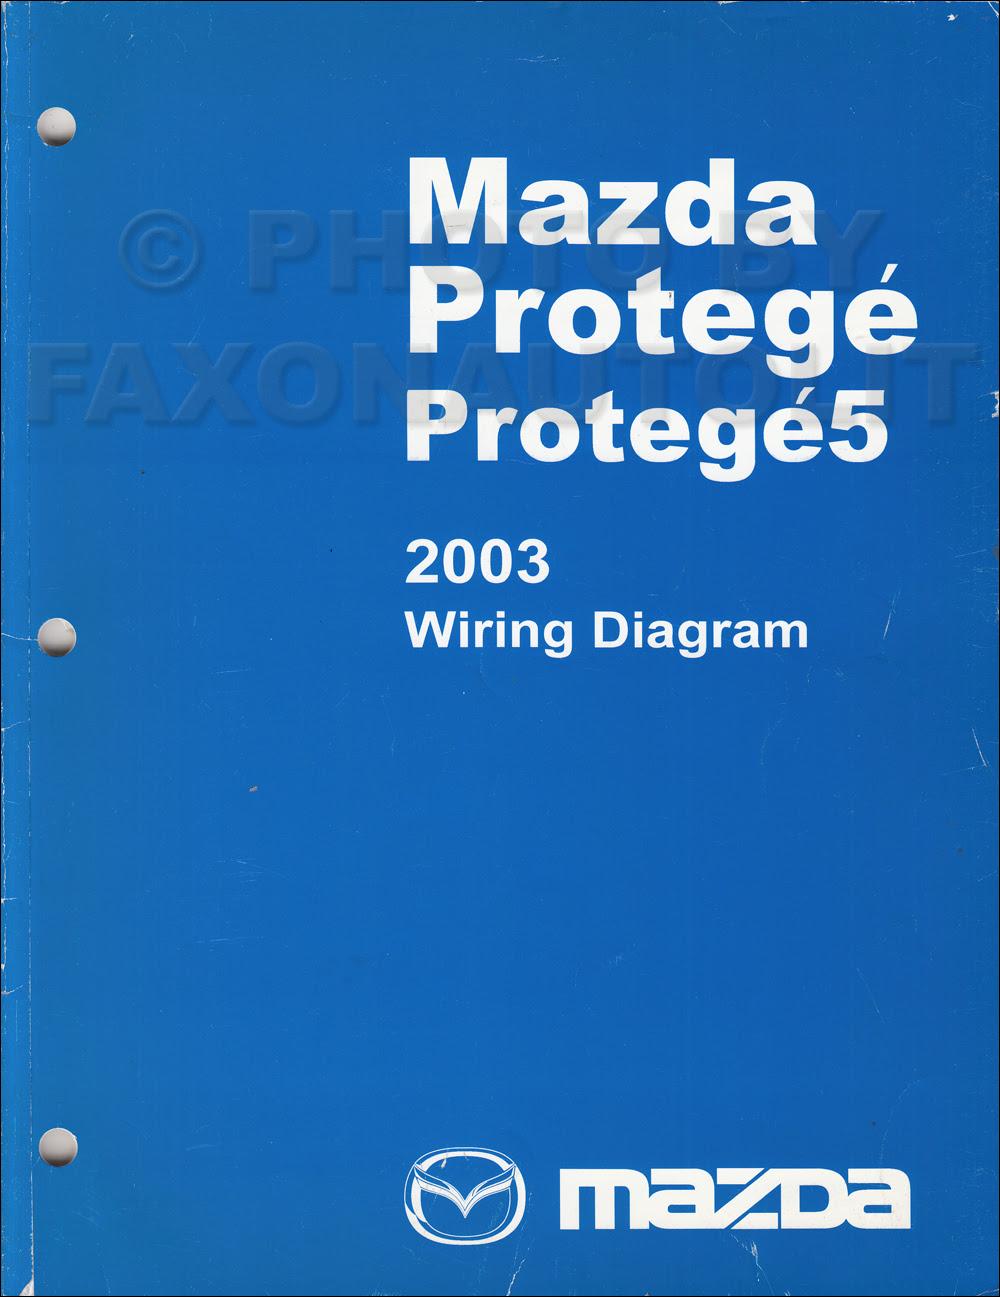 DIAGRAM] 1995 Chrysler Lhs Alternator Wiring Diagram FULL Version HD  Quality Wiring Diagram - BIUMEDIAGRAM.SKINE.FRSkine.fr